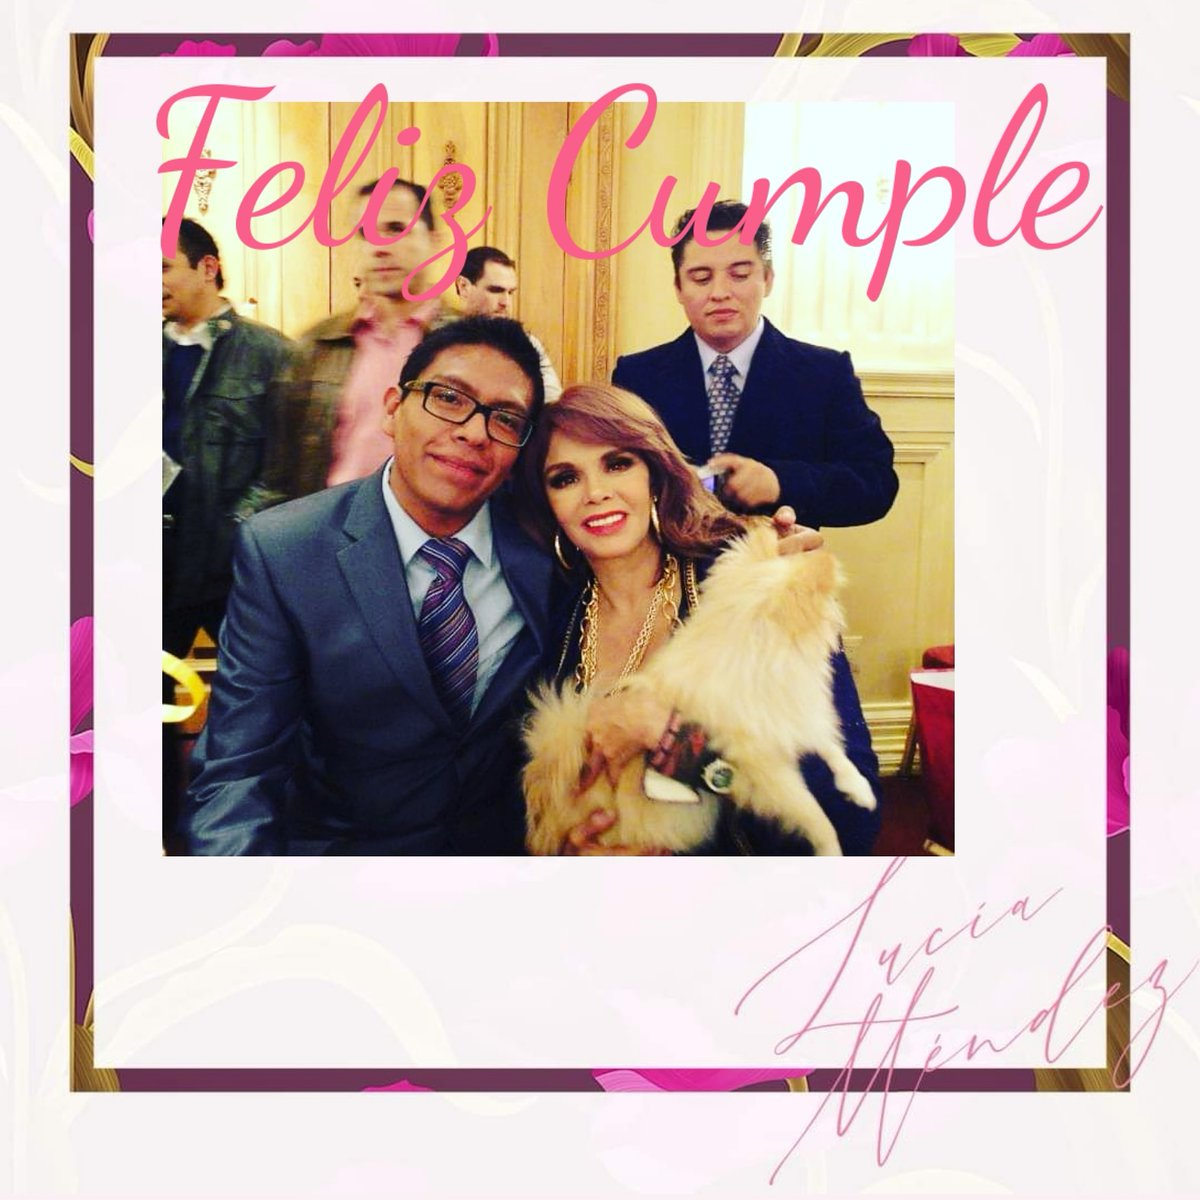 Te amamos Méndez #felizcumple @TeamLuciaMendez